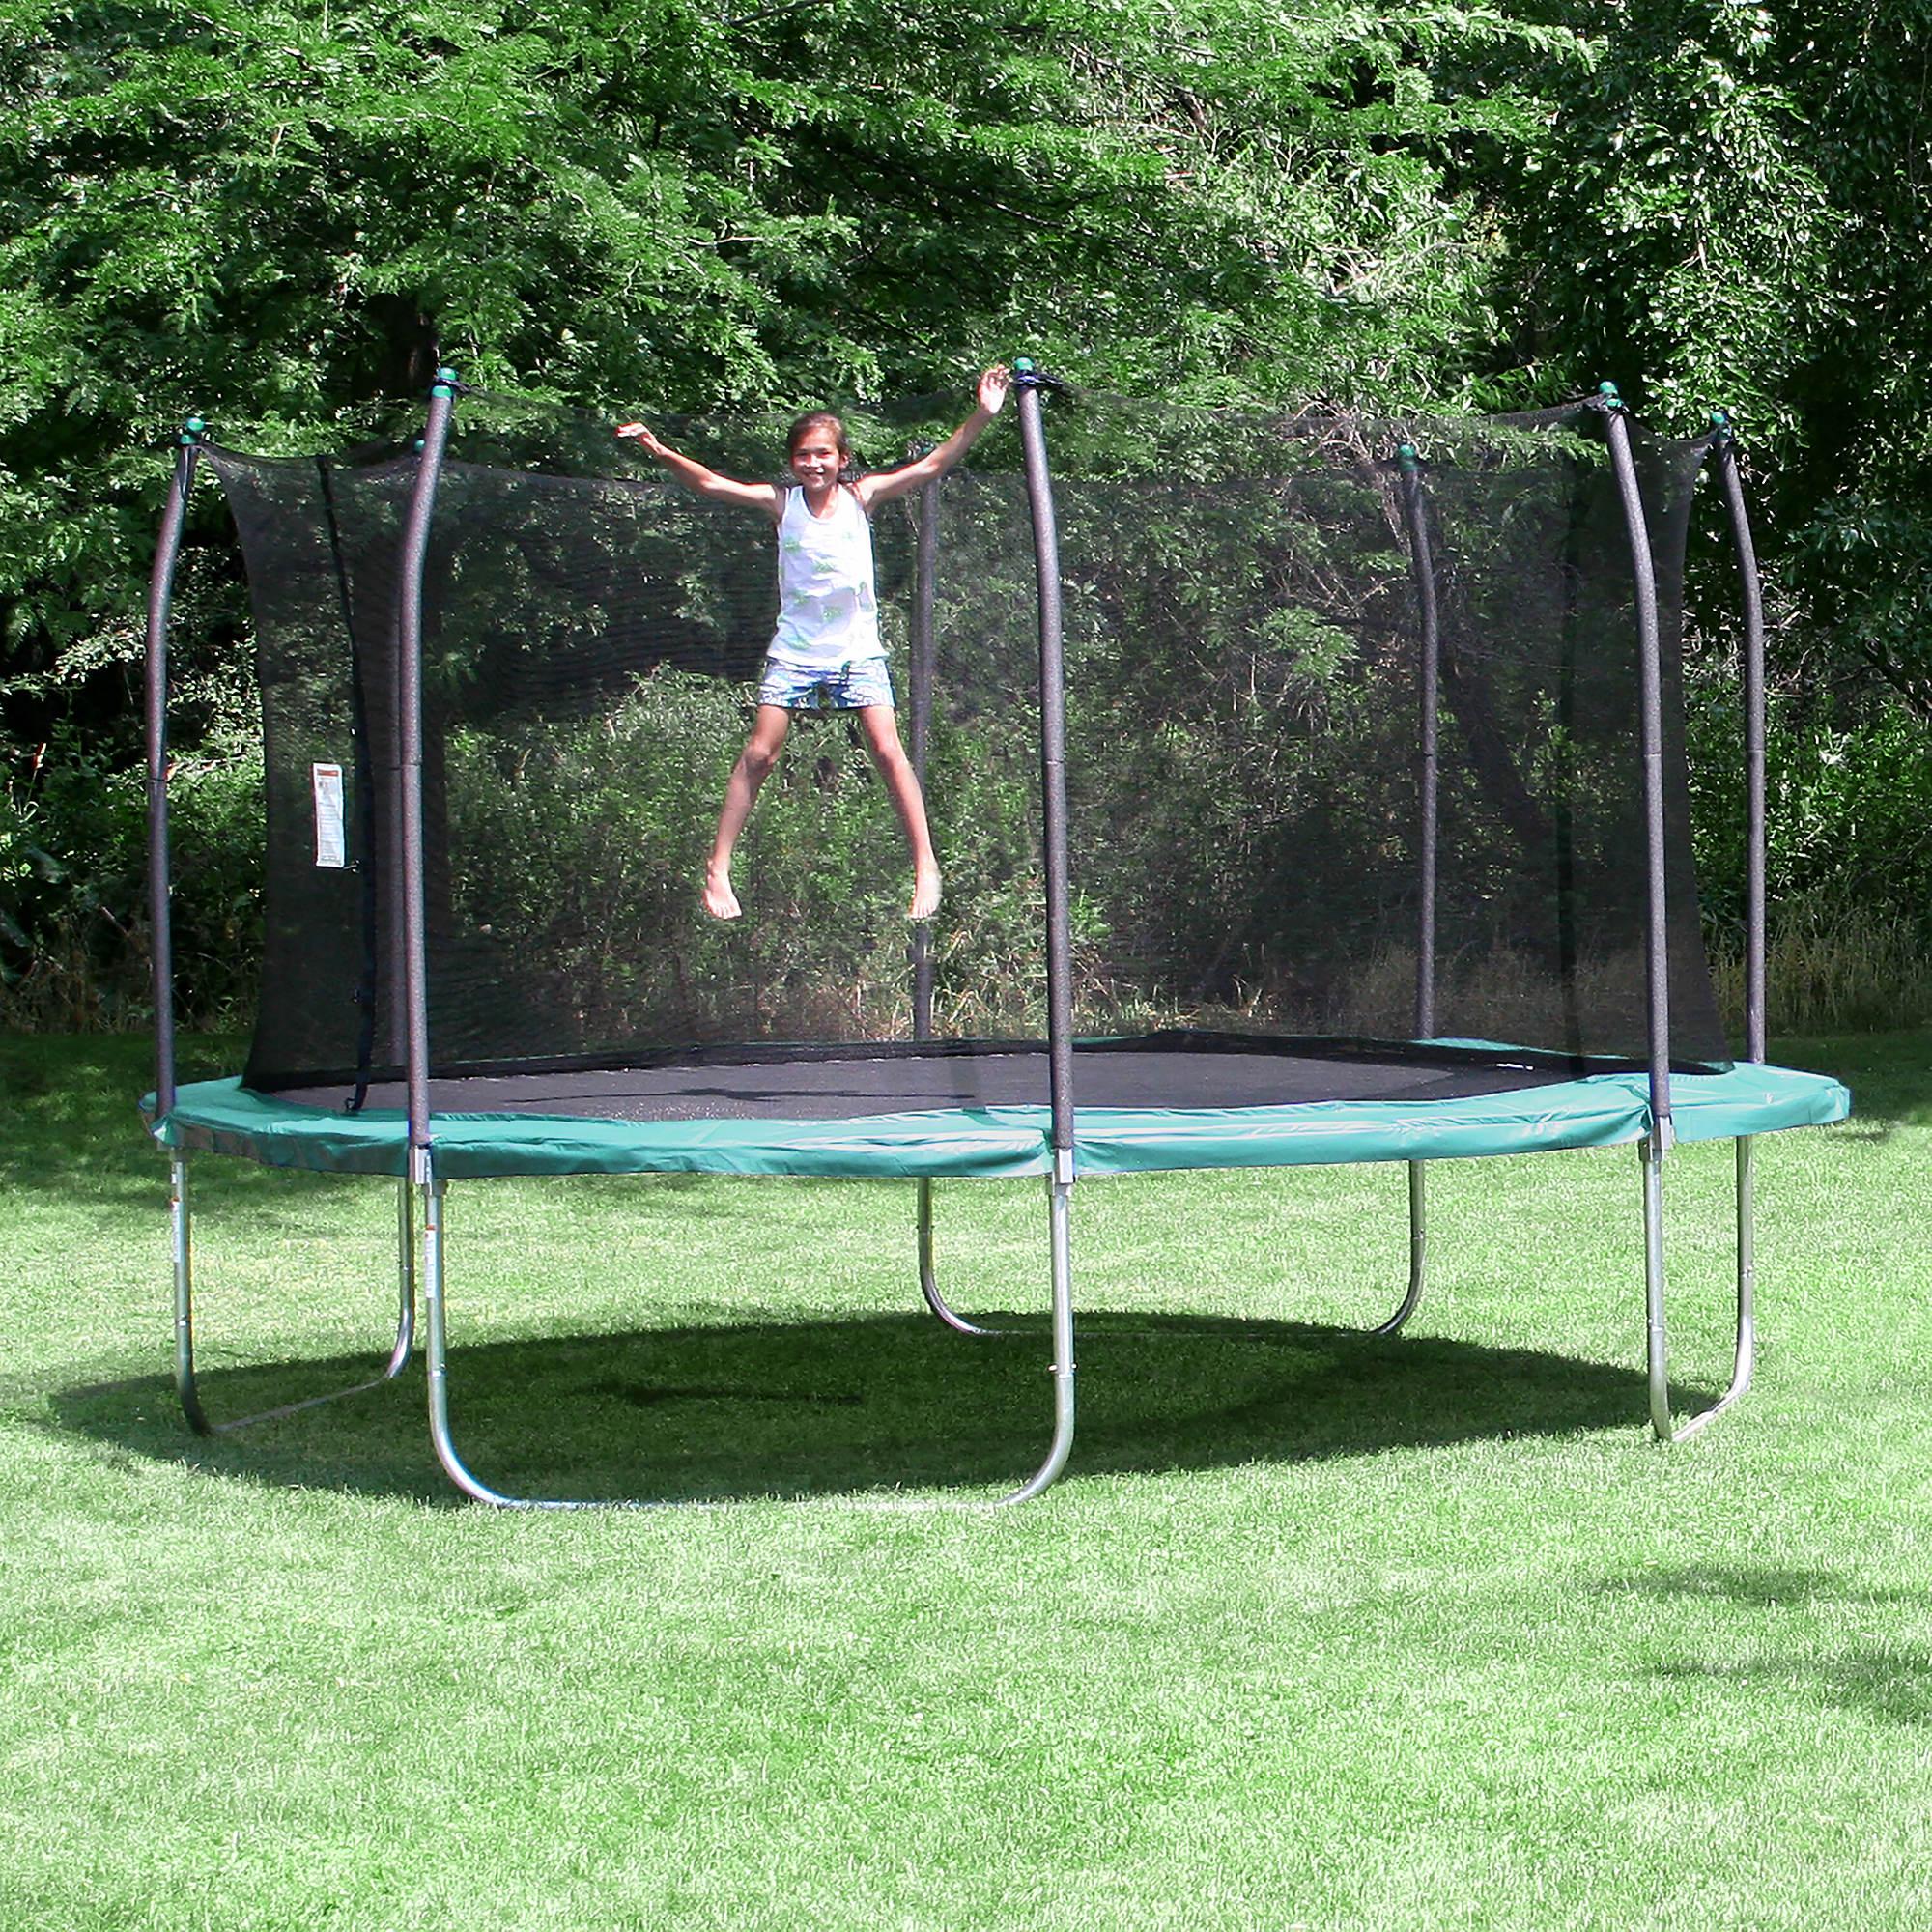 Skywalker Trampolines 15 Foot Sq Trampoline And Safety: Skywalker Trampolines 15' Square Trampoline With Enclosure